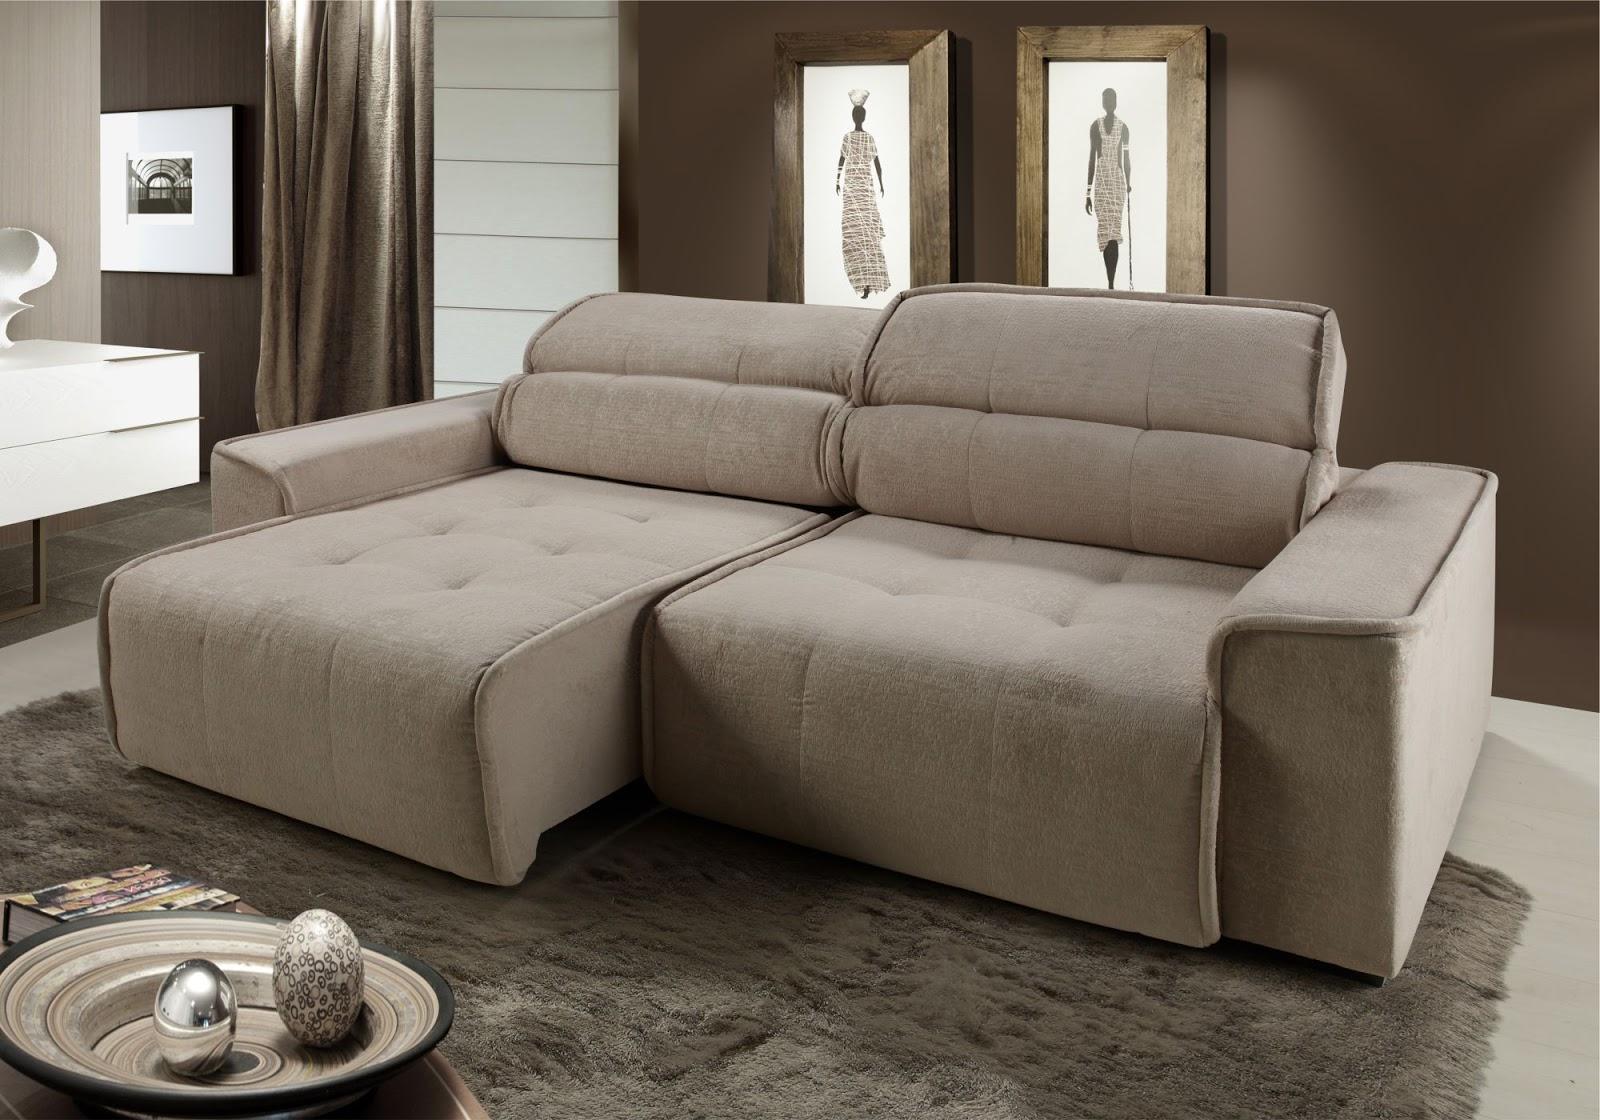 Sofas Modernos Para Sala Pequena